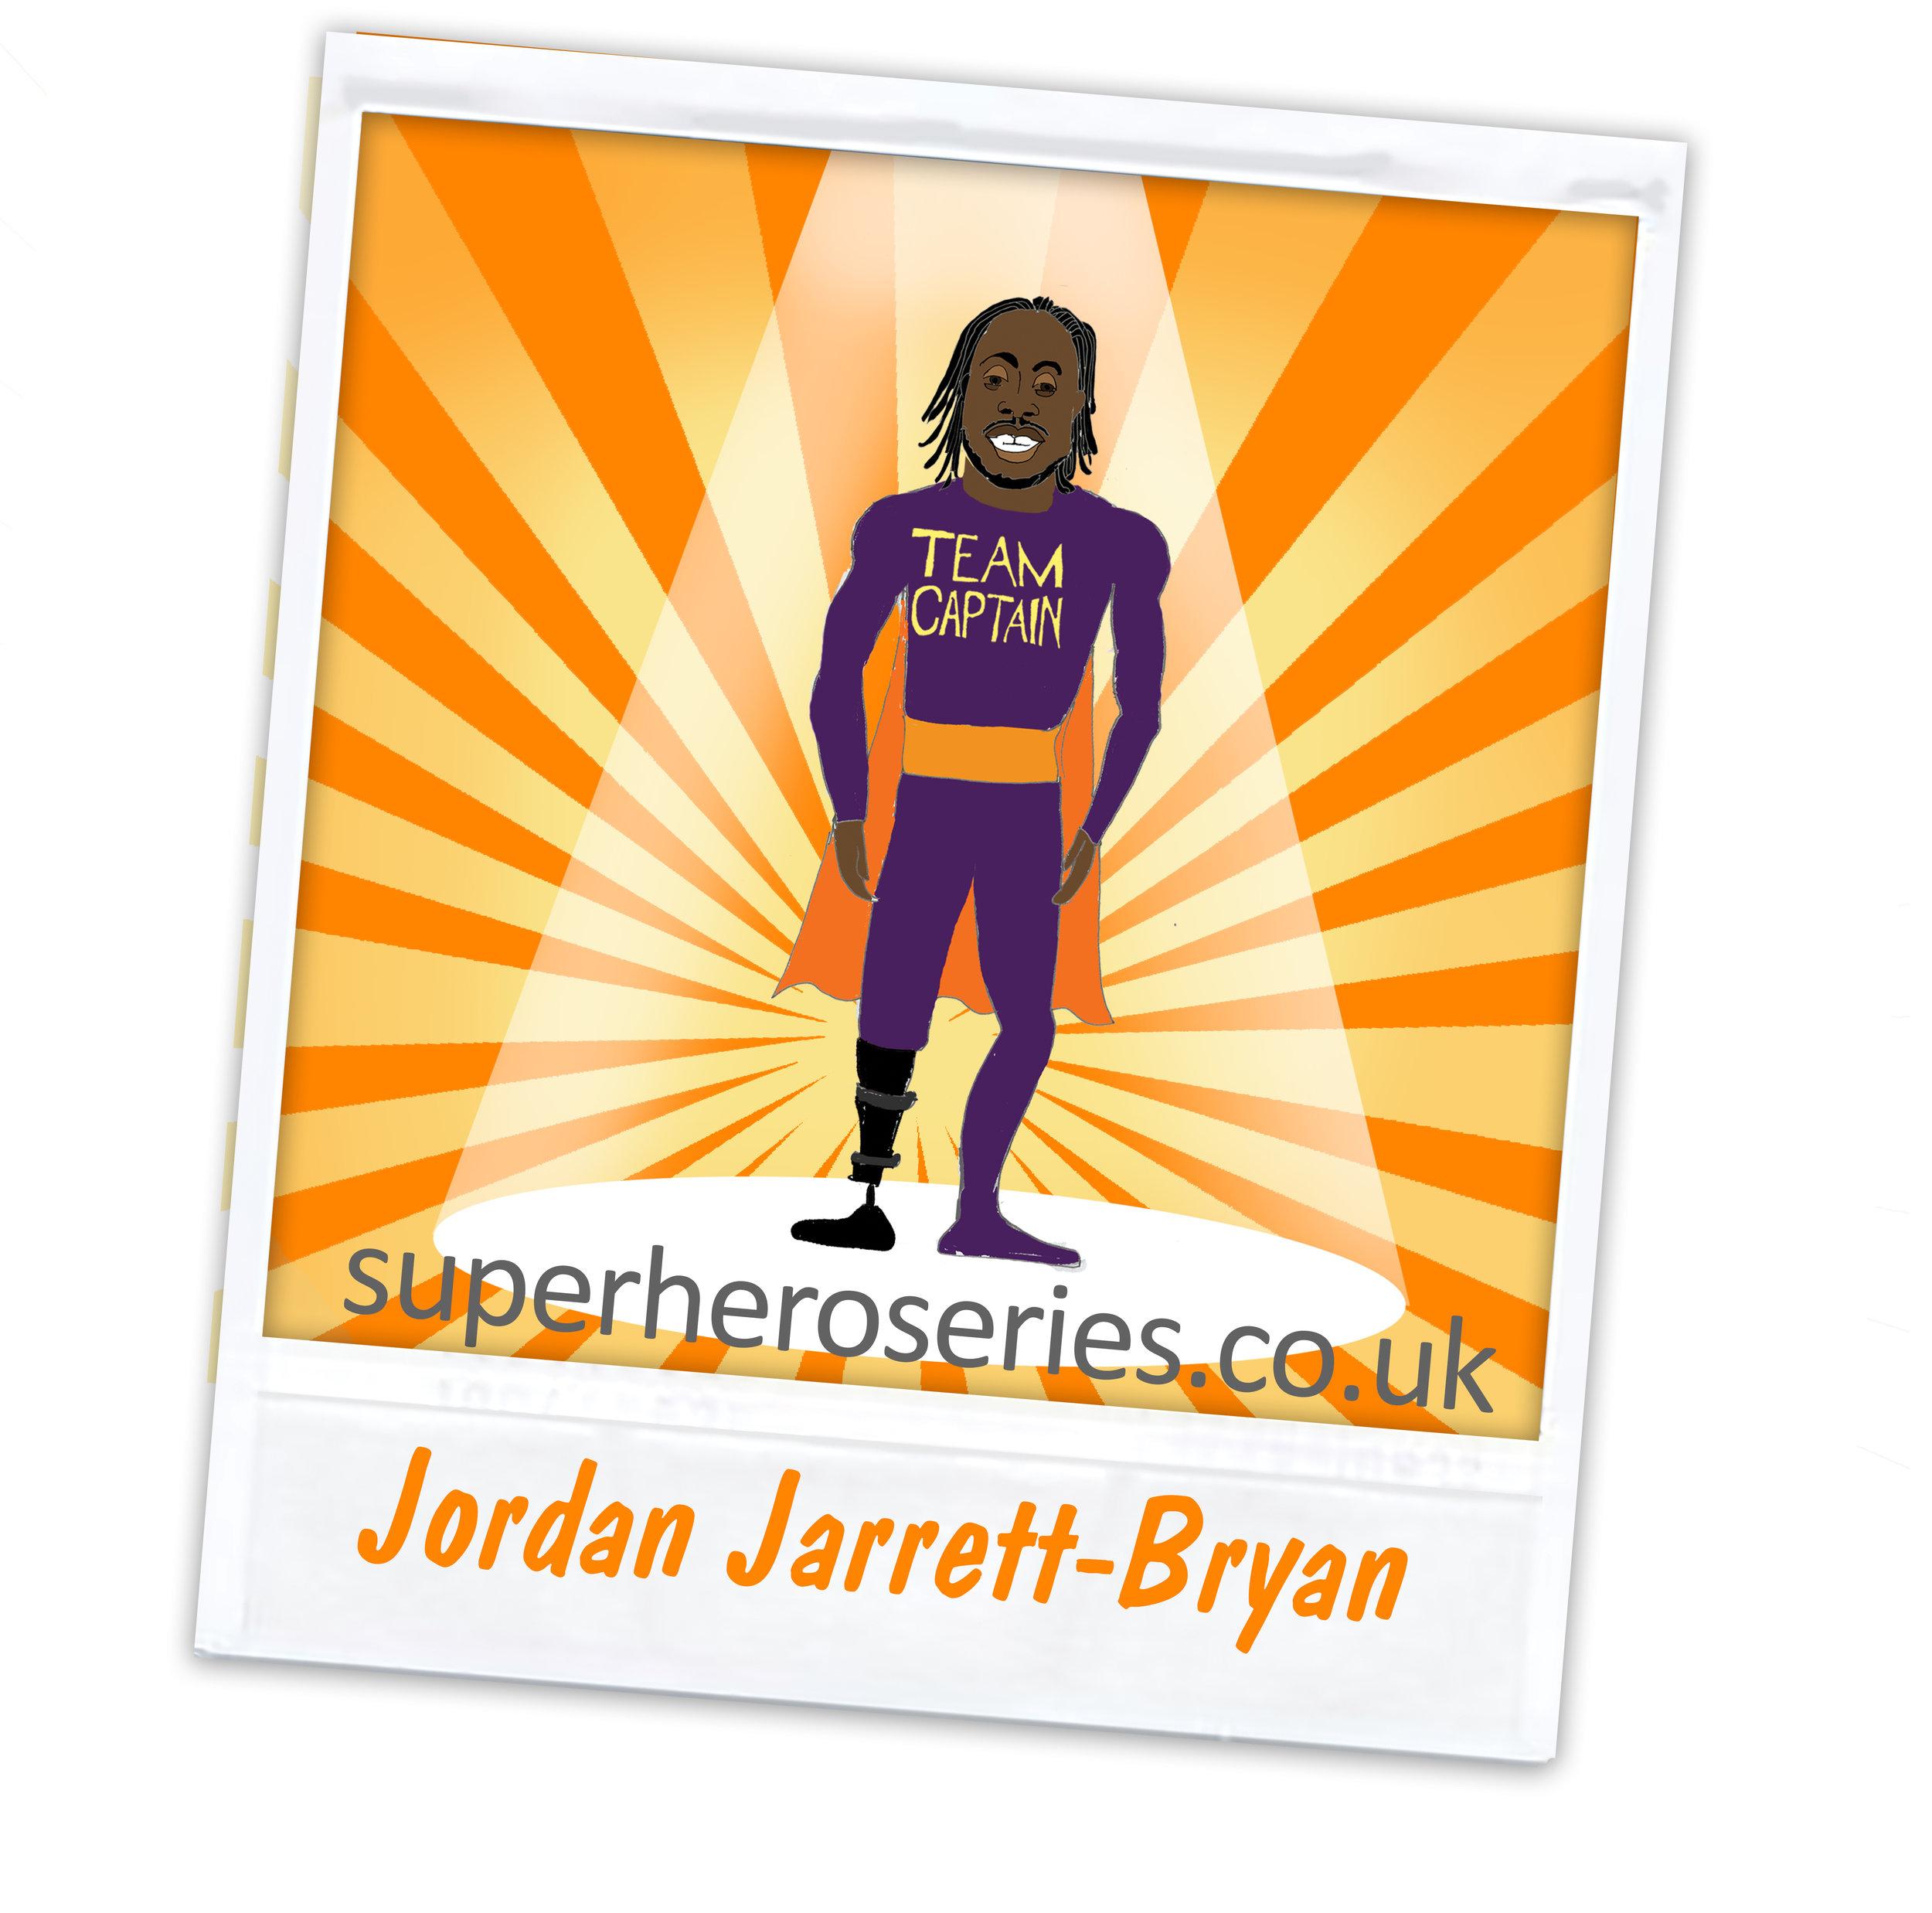 Jordan JJ Right.jpg